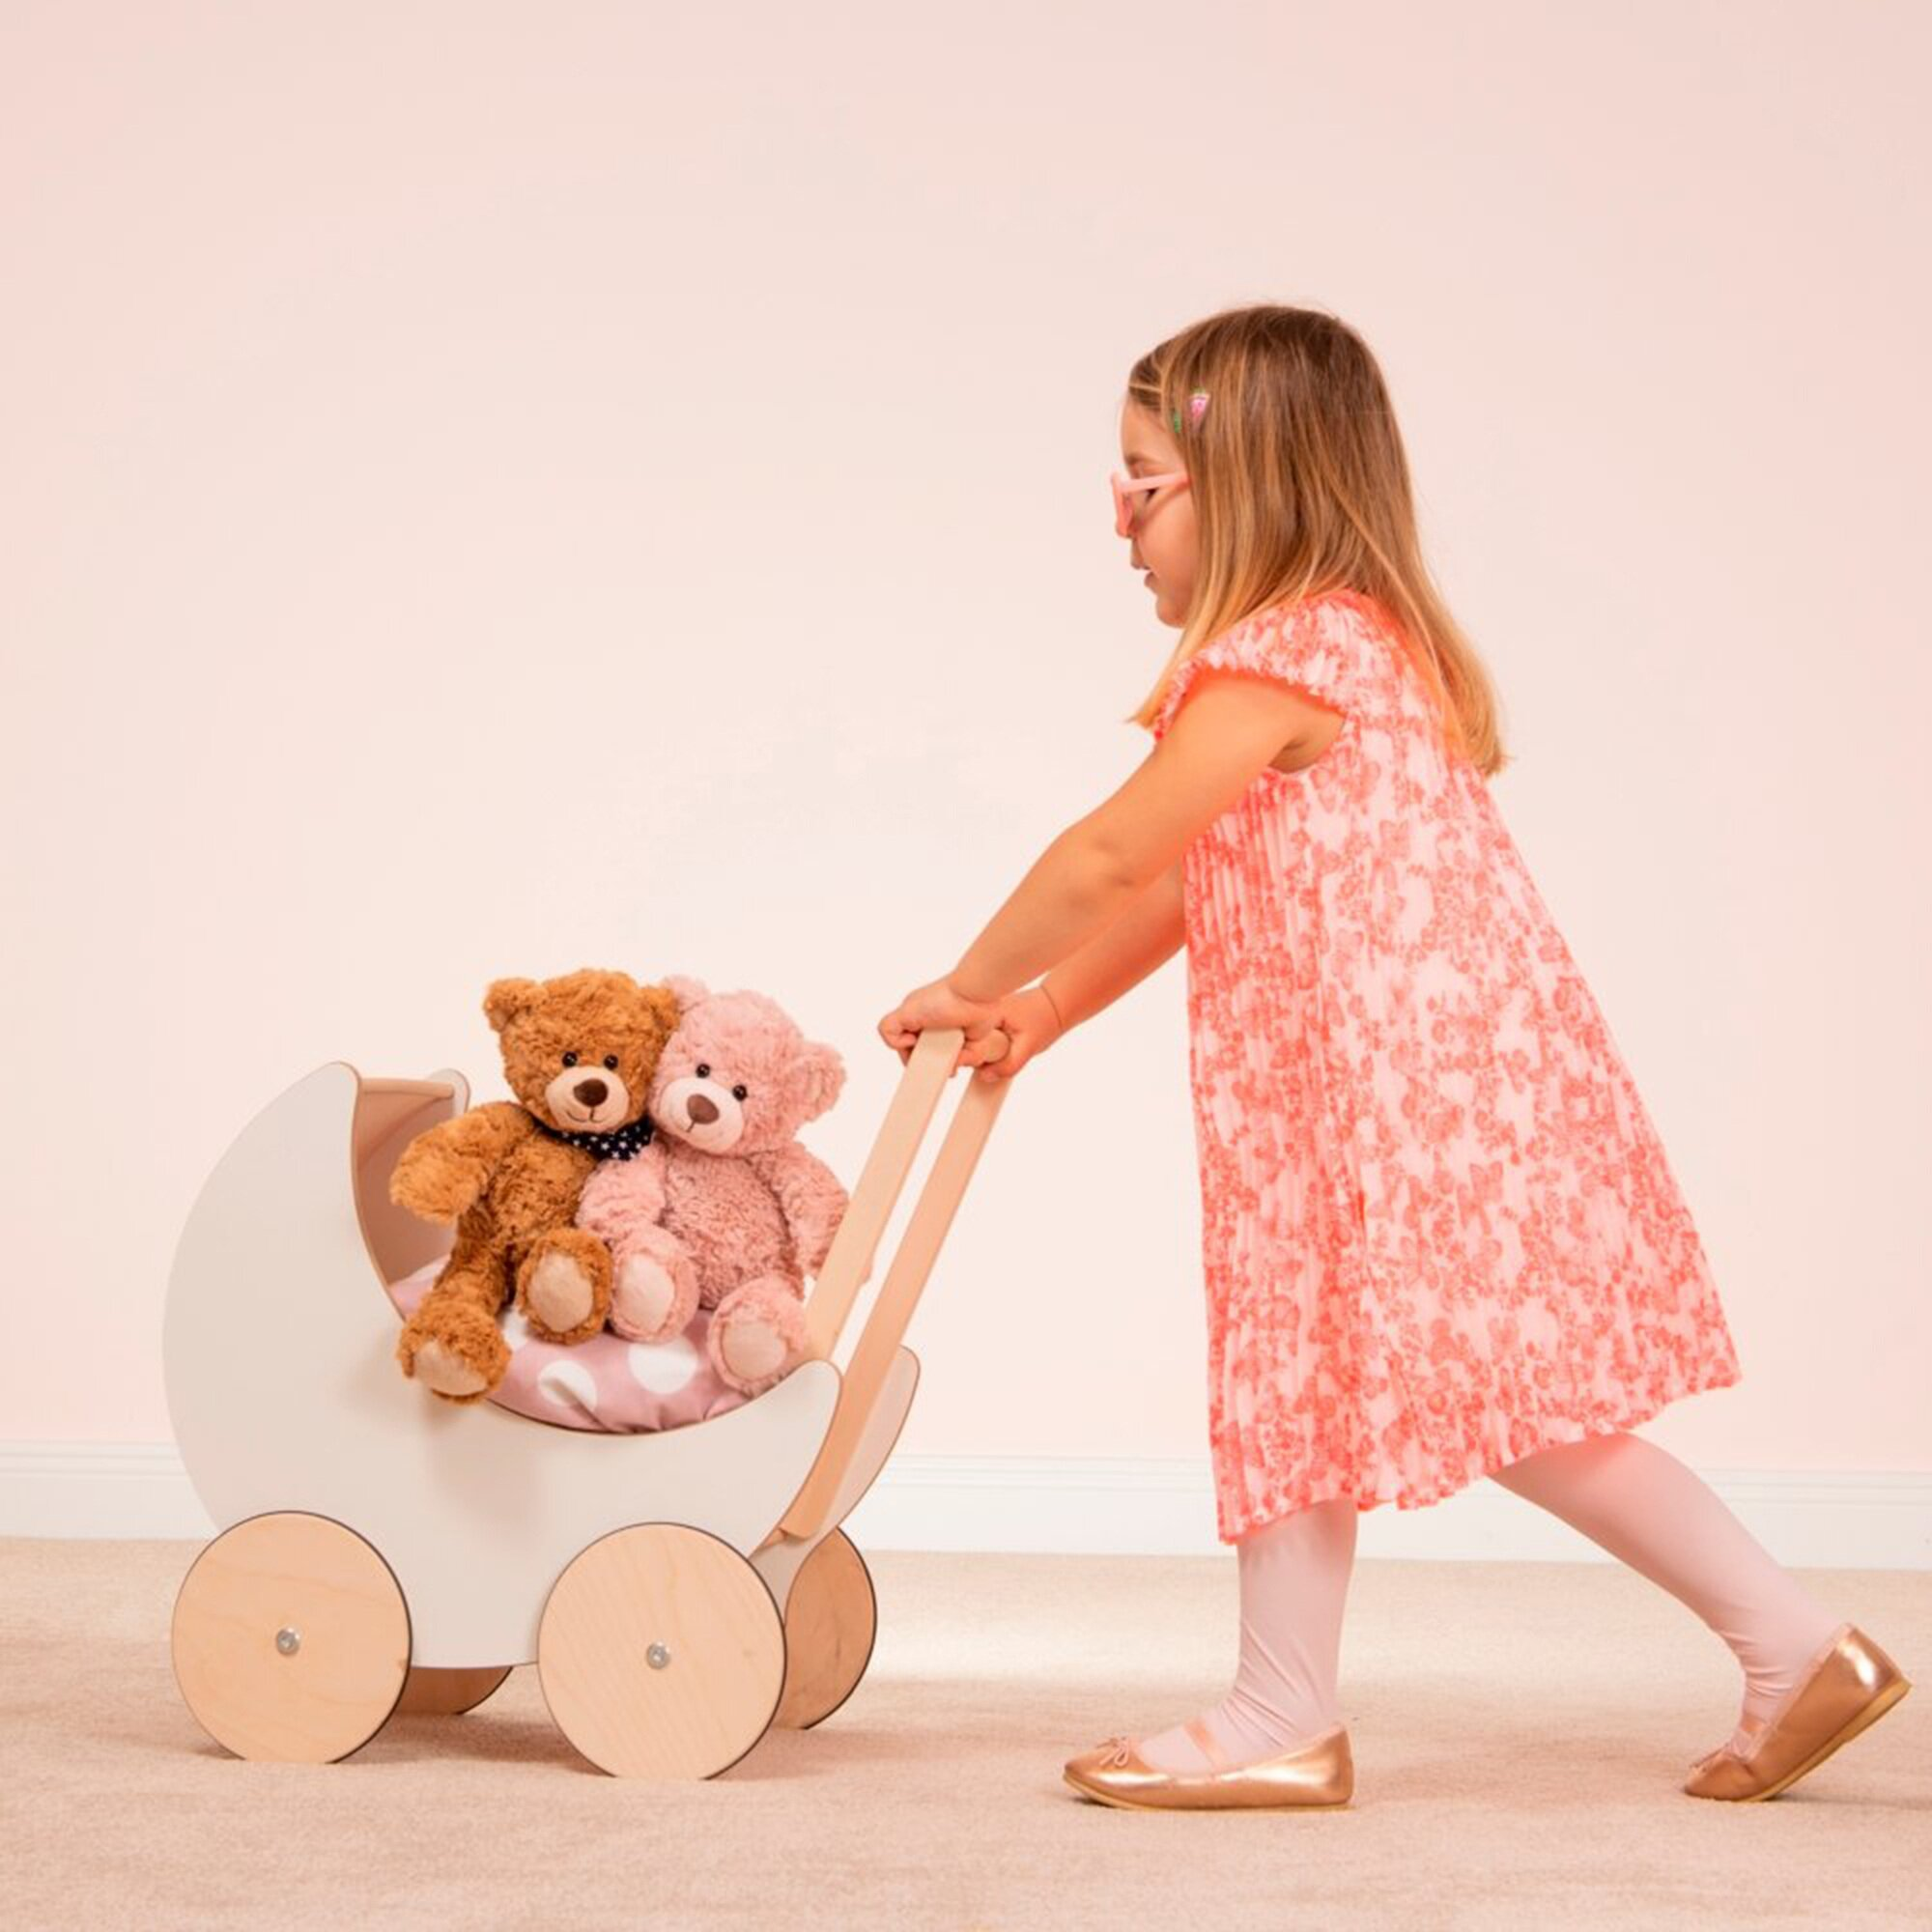 hermann-teddy-collection-teddy-rufus-30cm